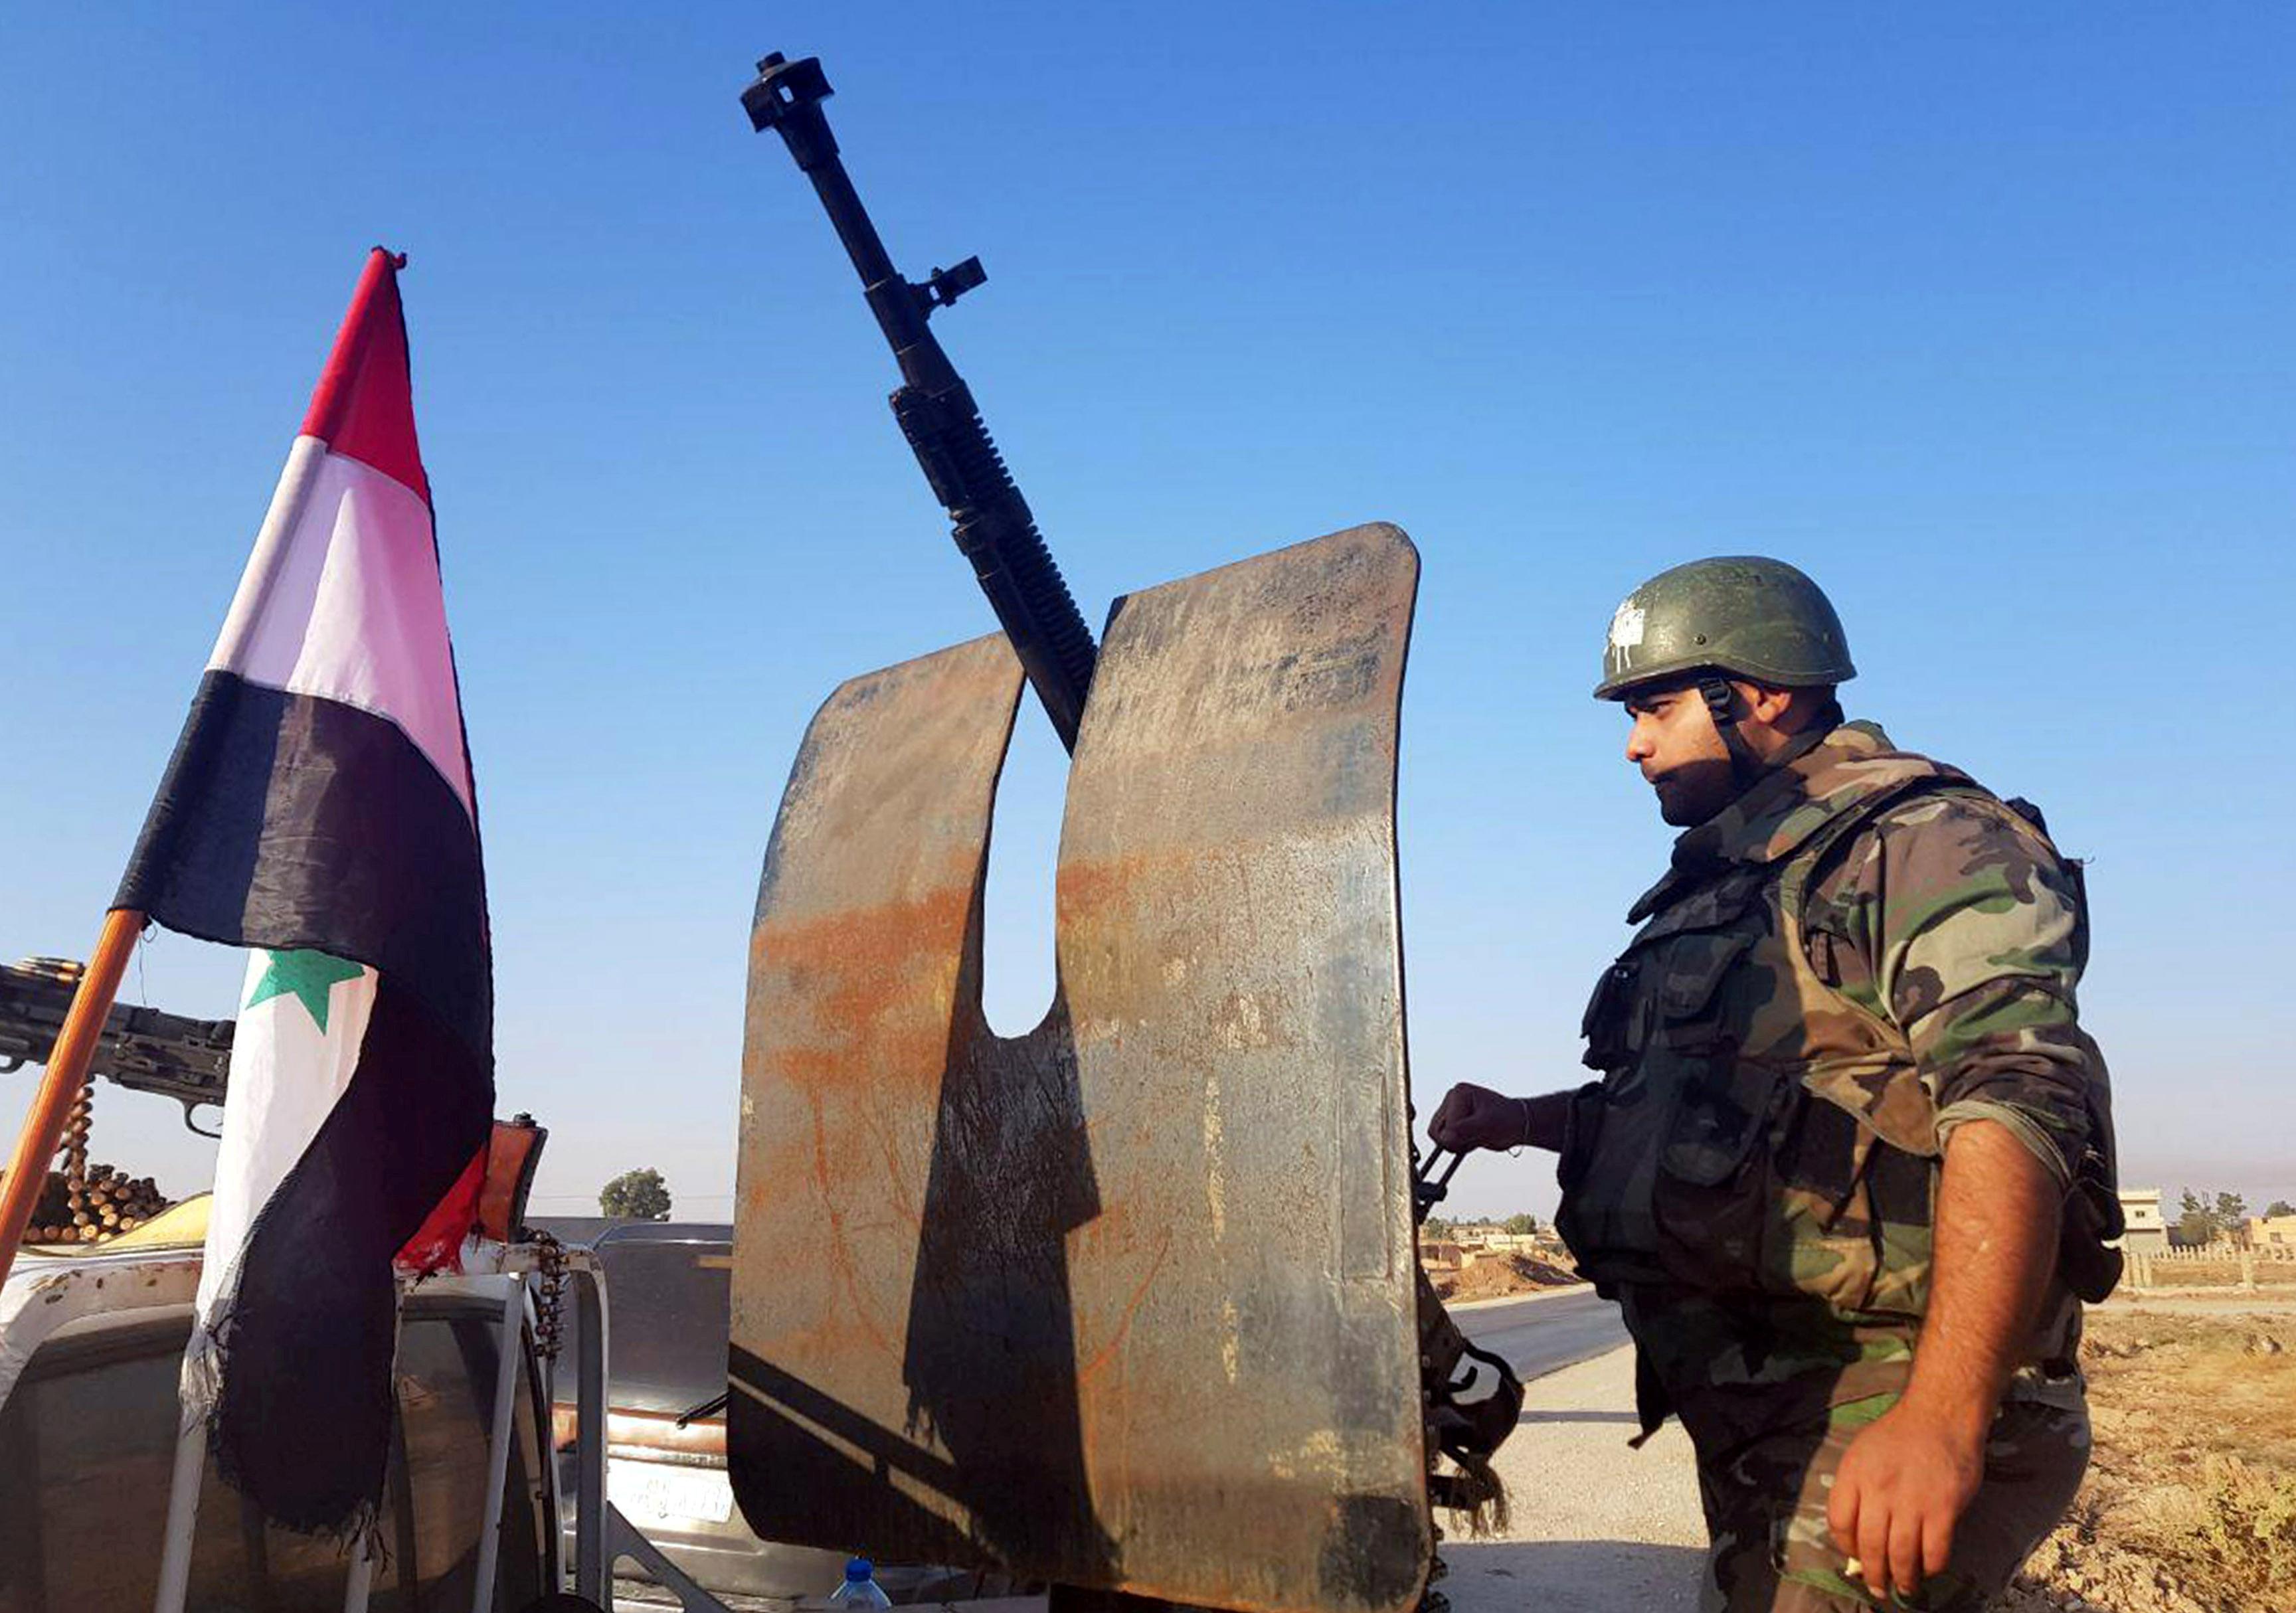 U.S. demands Syria ceasefire, slaps sanctions on Turkey over incursion